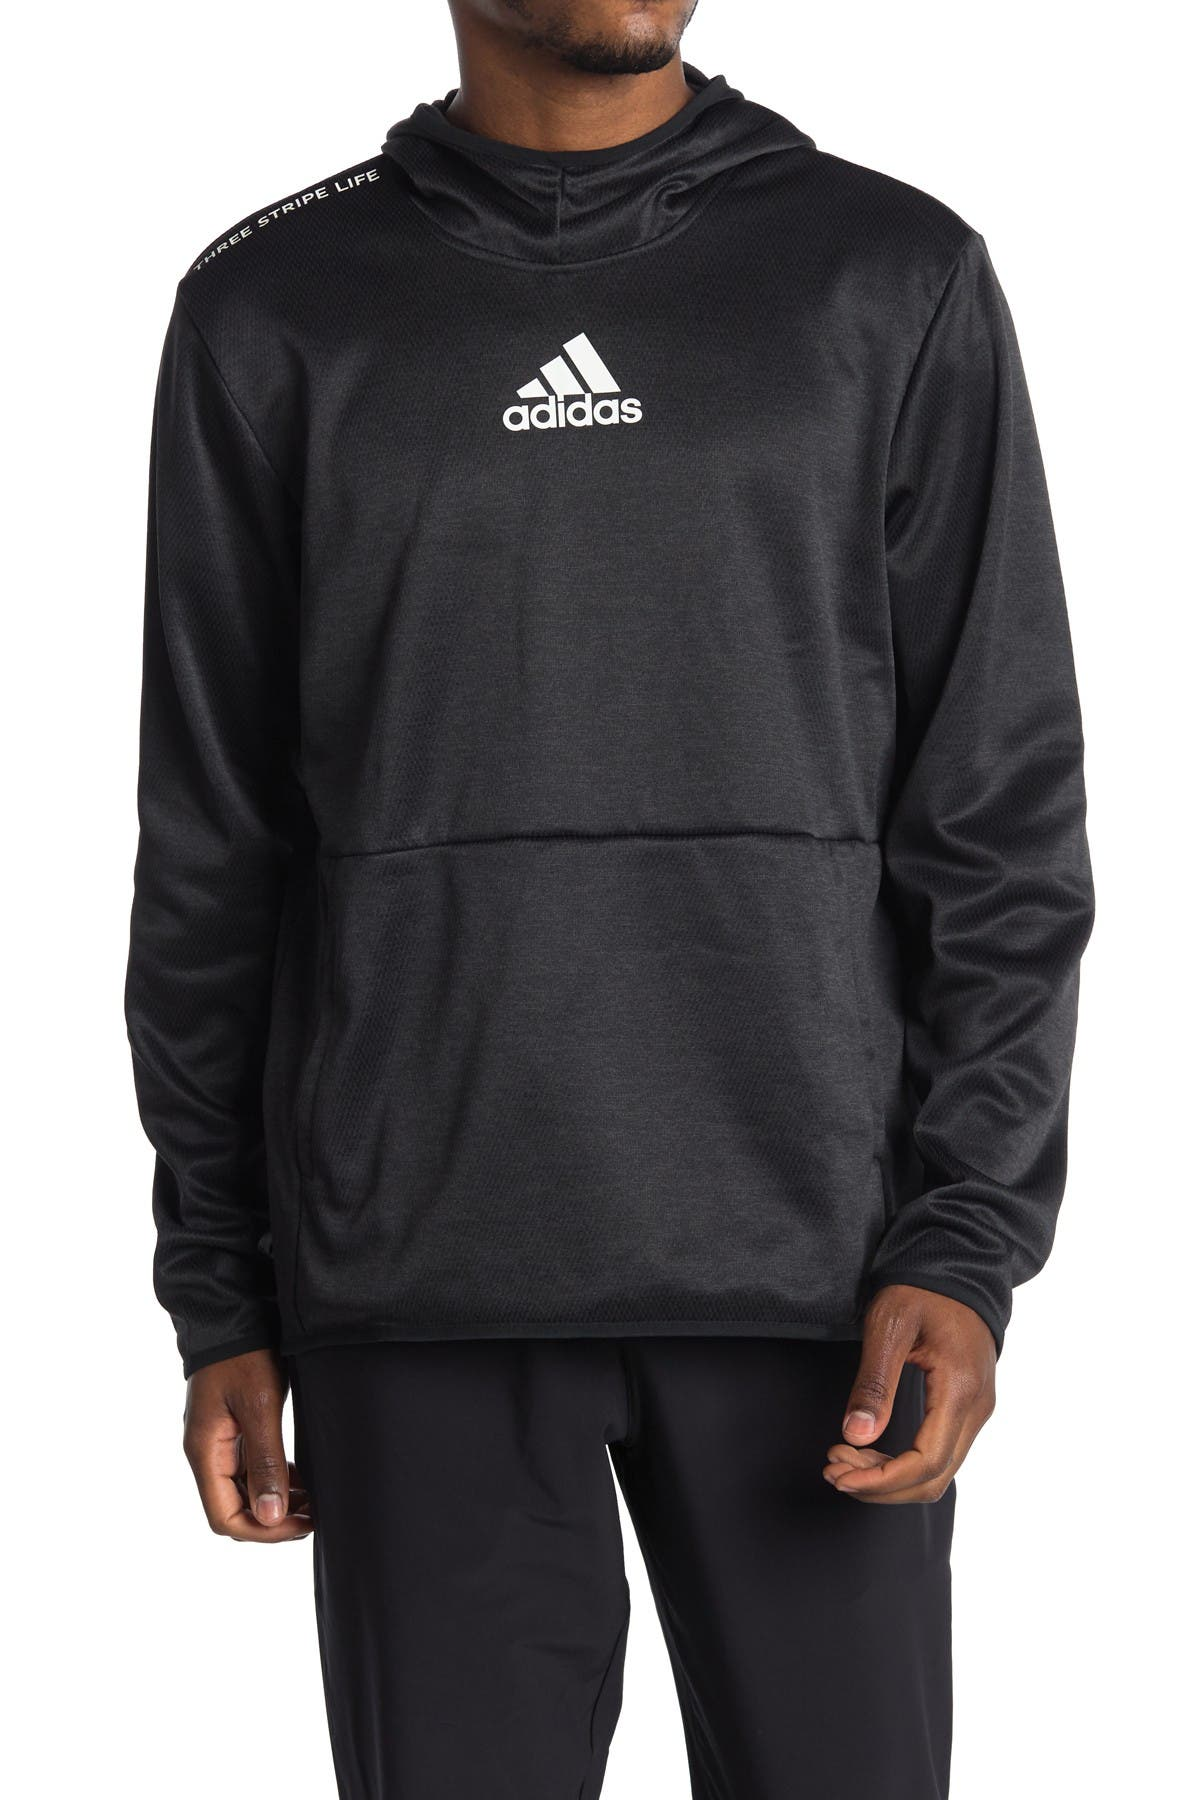 Image of adidas Team Issue Hoodie